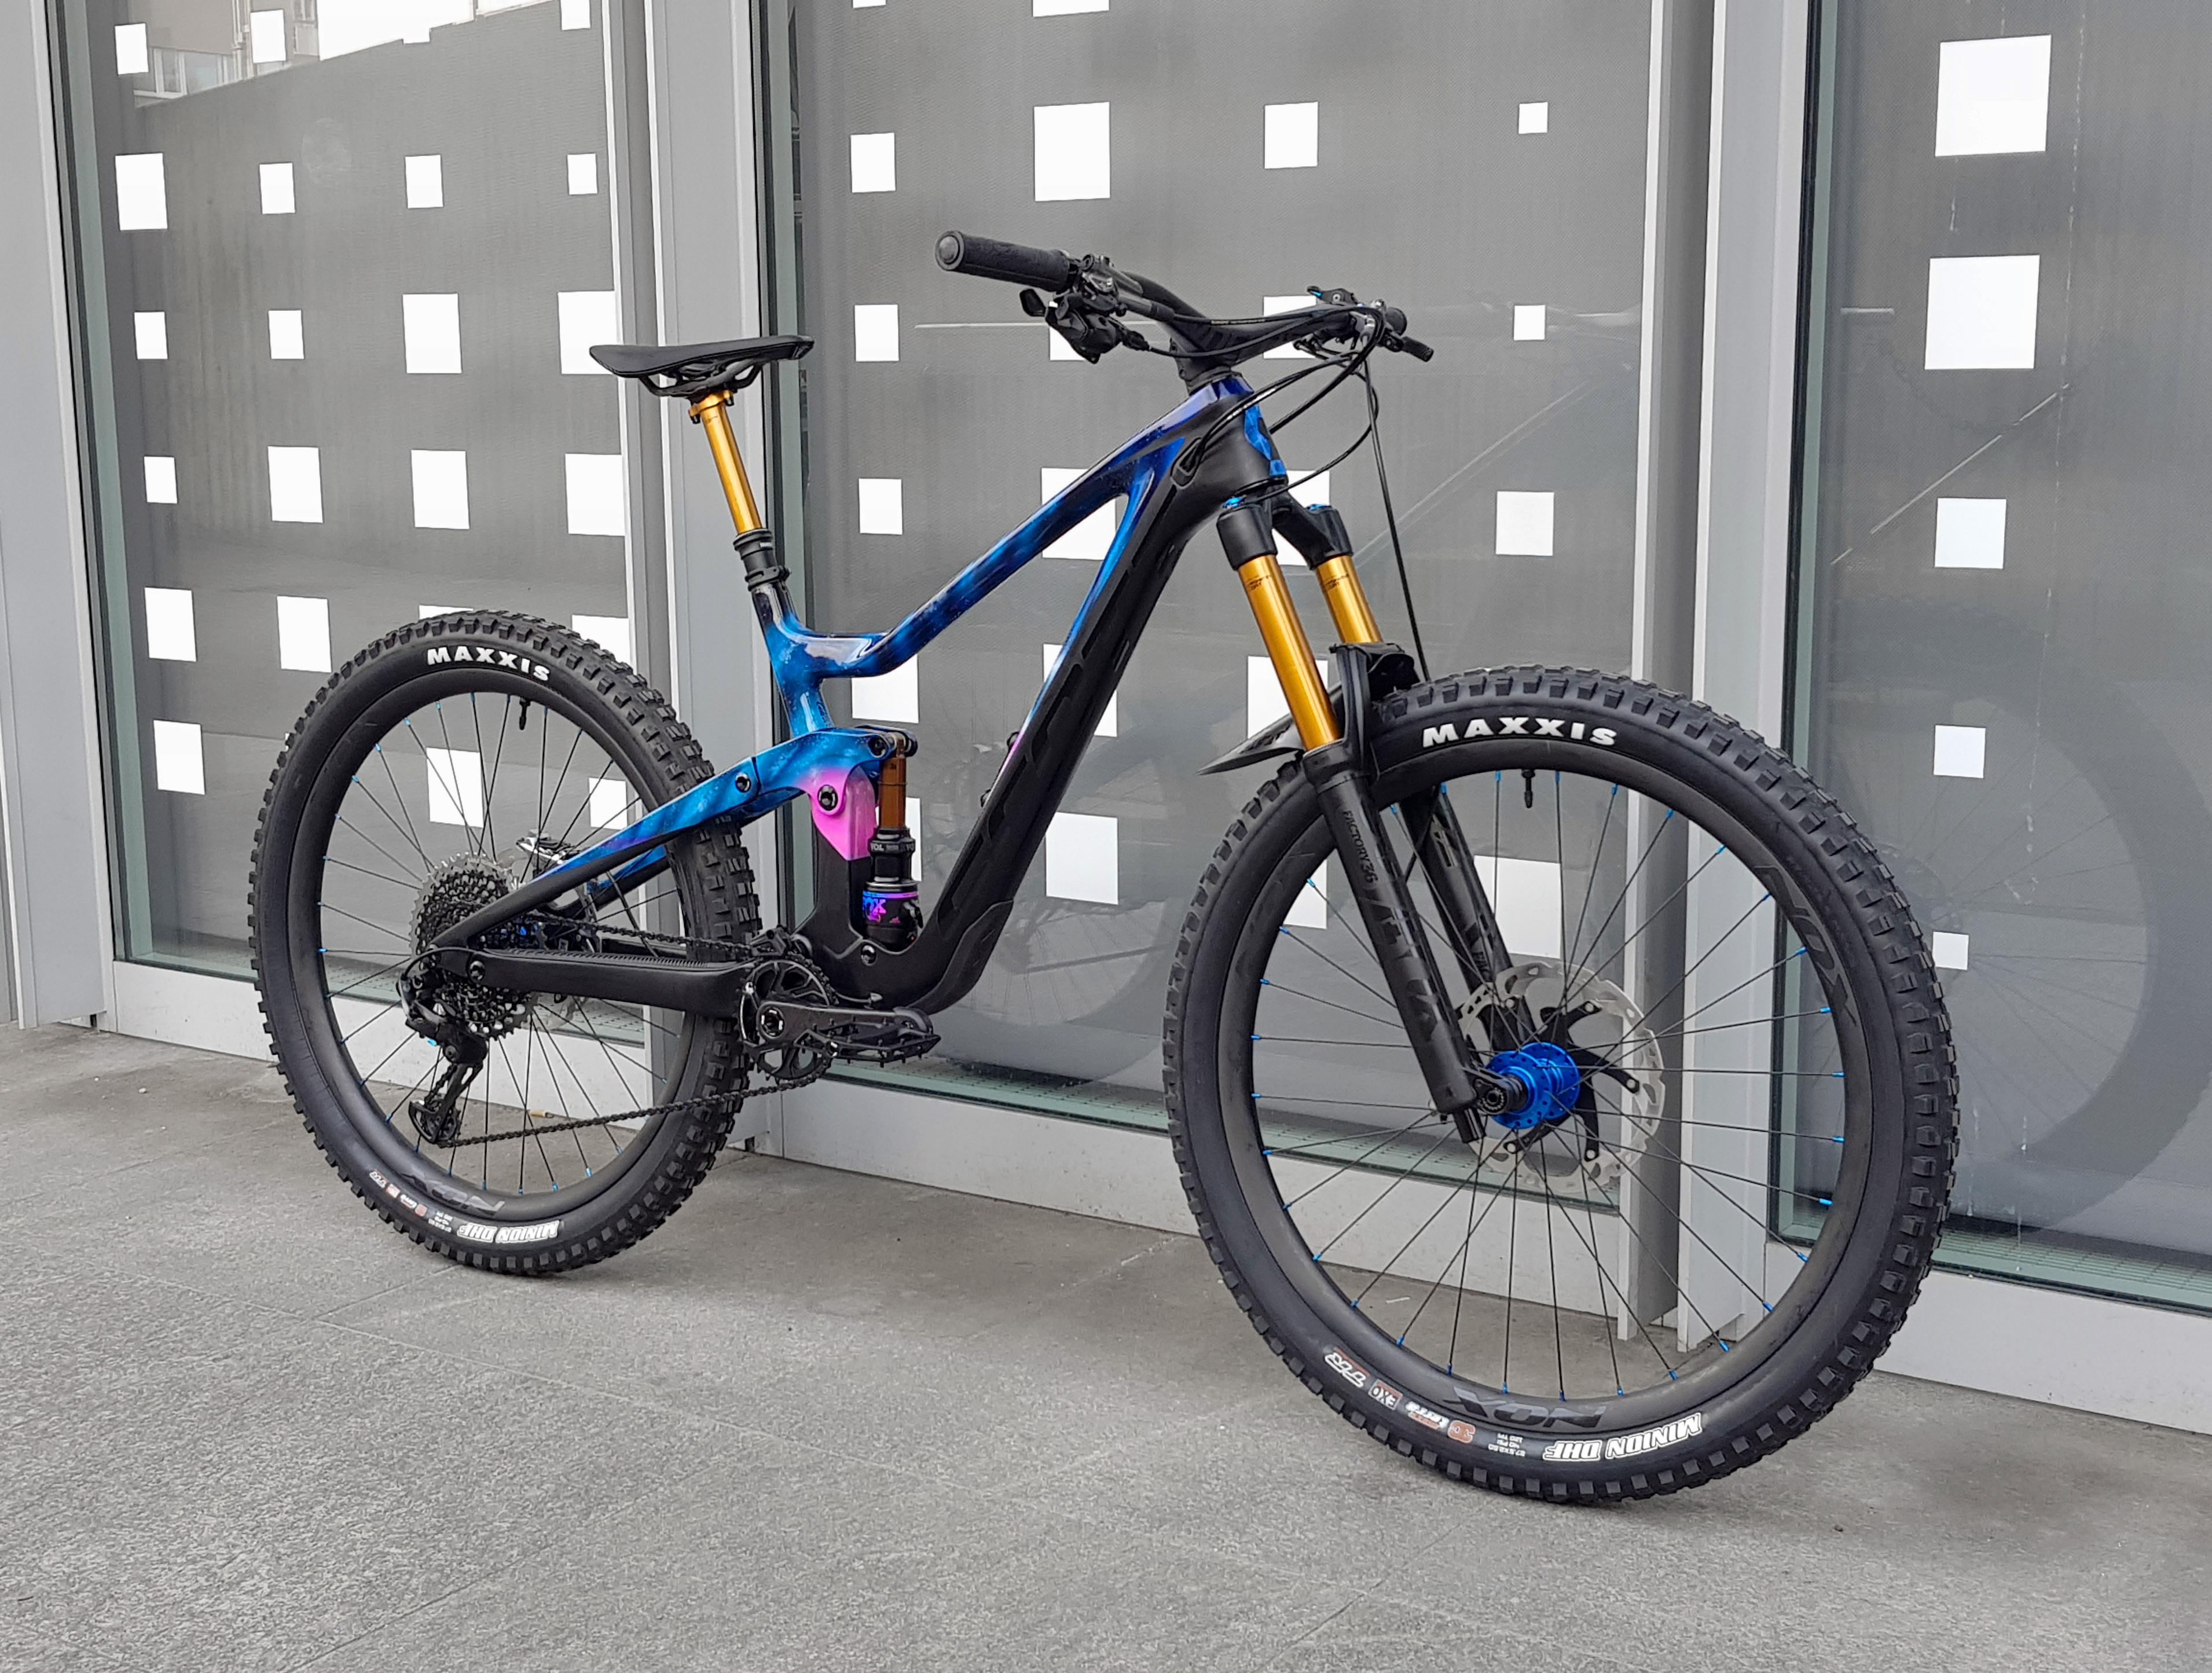 Simano XTR Wheel Rim Decals Stickers Set of 6 MTB Bike Racing Cycle